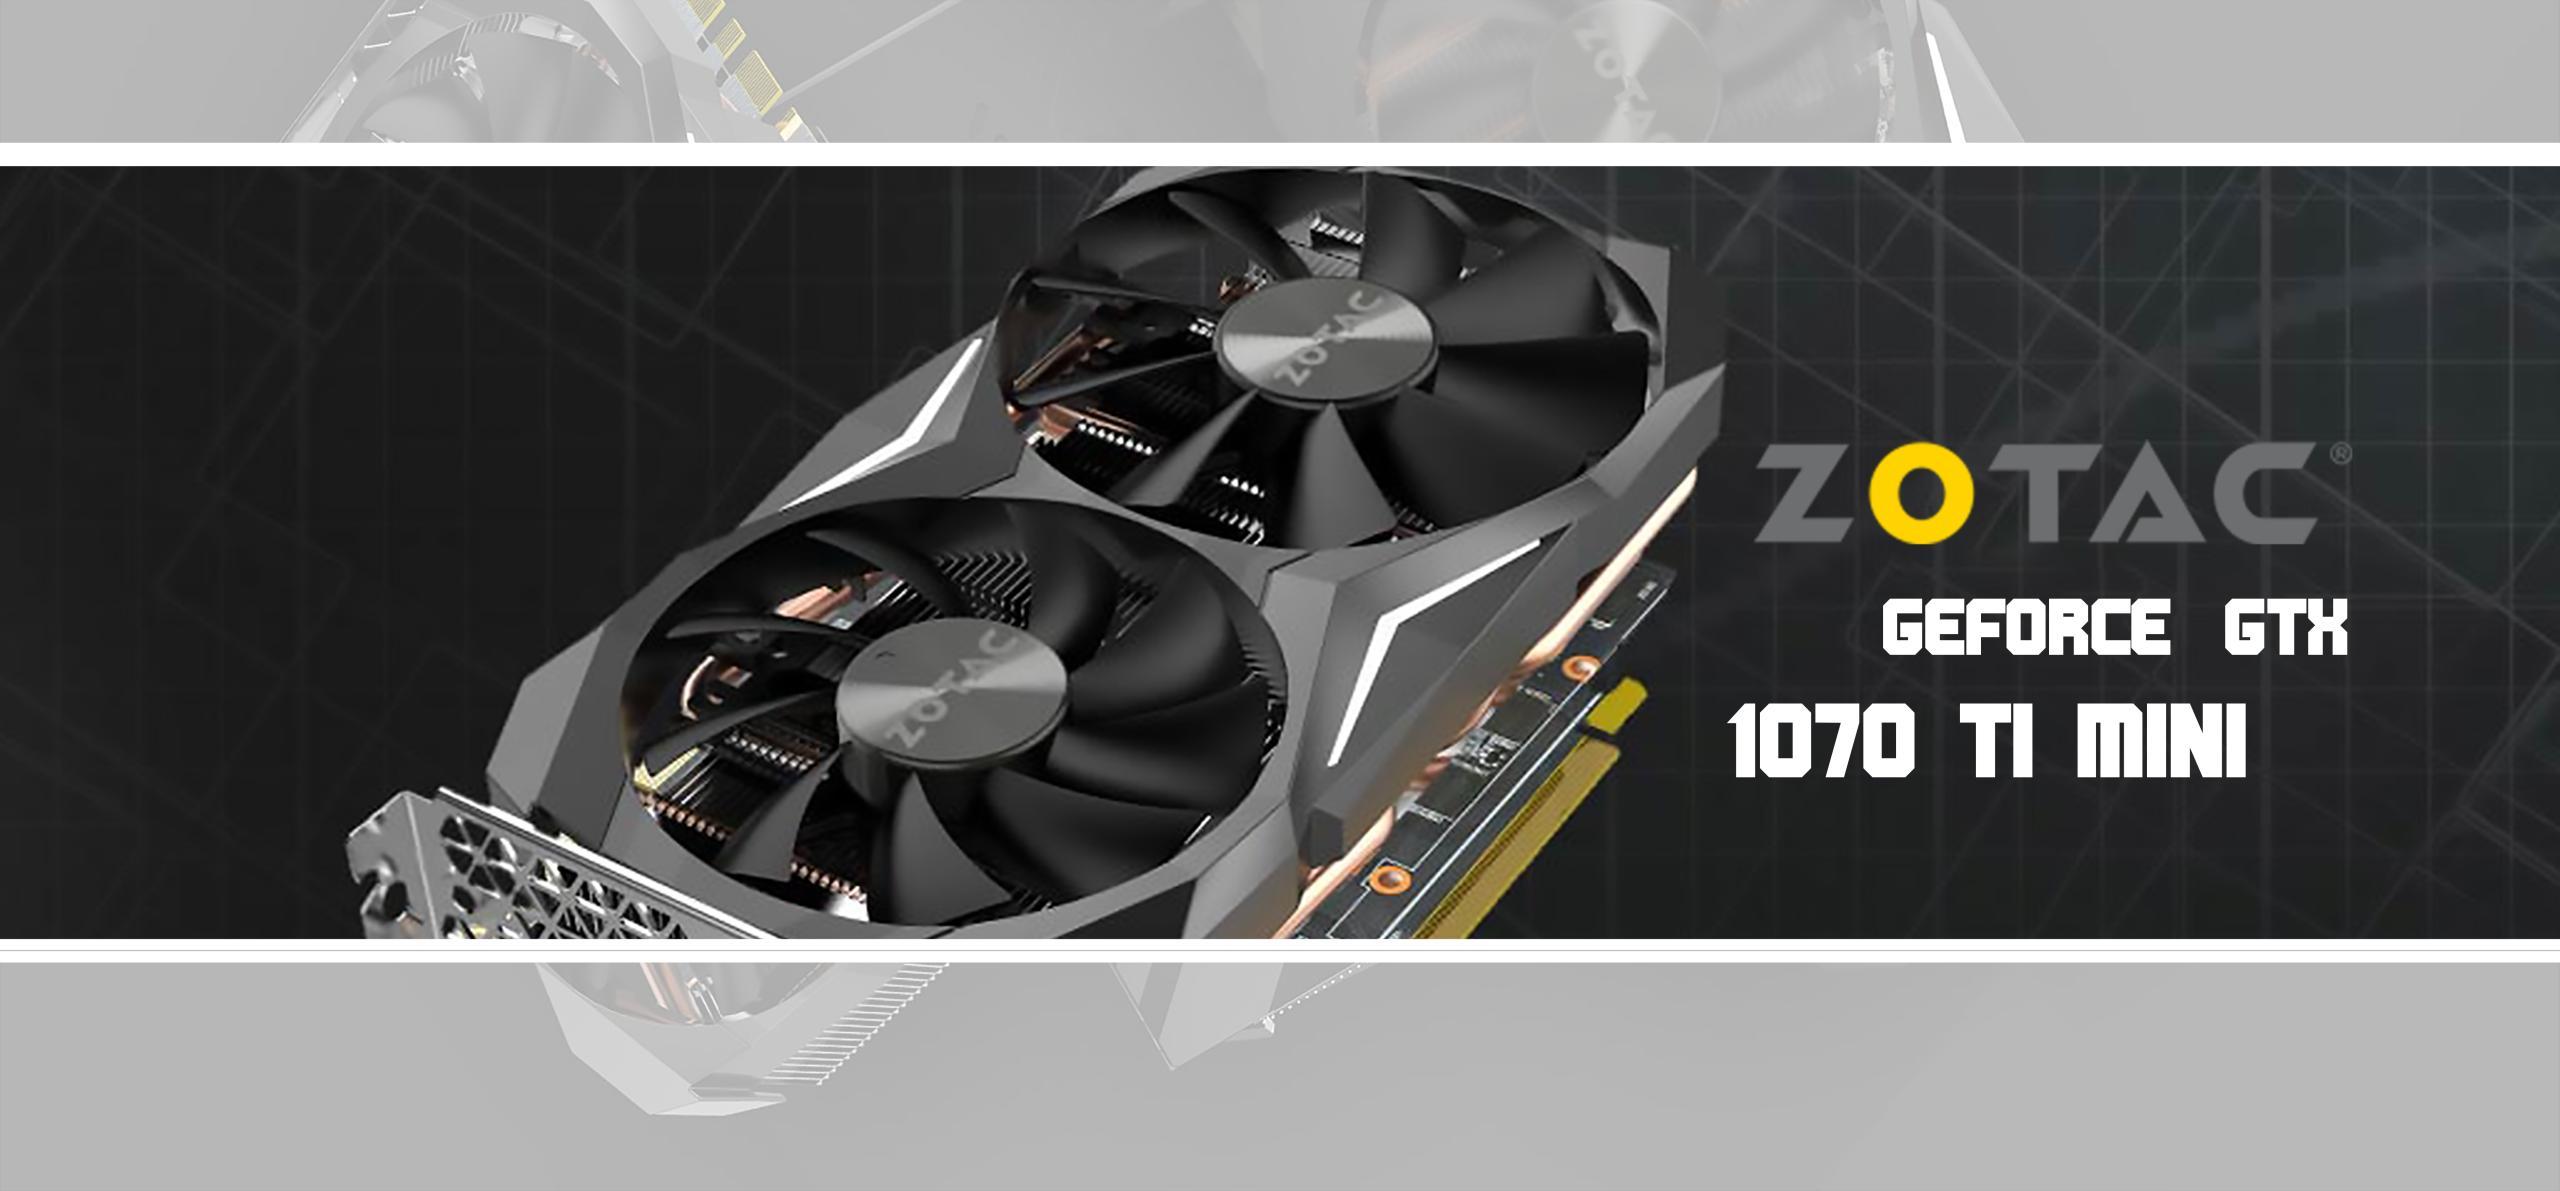 ZOTAC GeForce GTX 1070 Ti Mini - logo